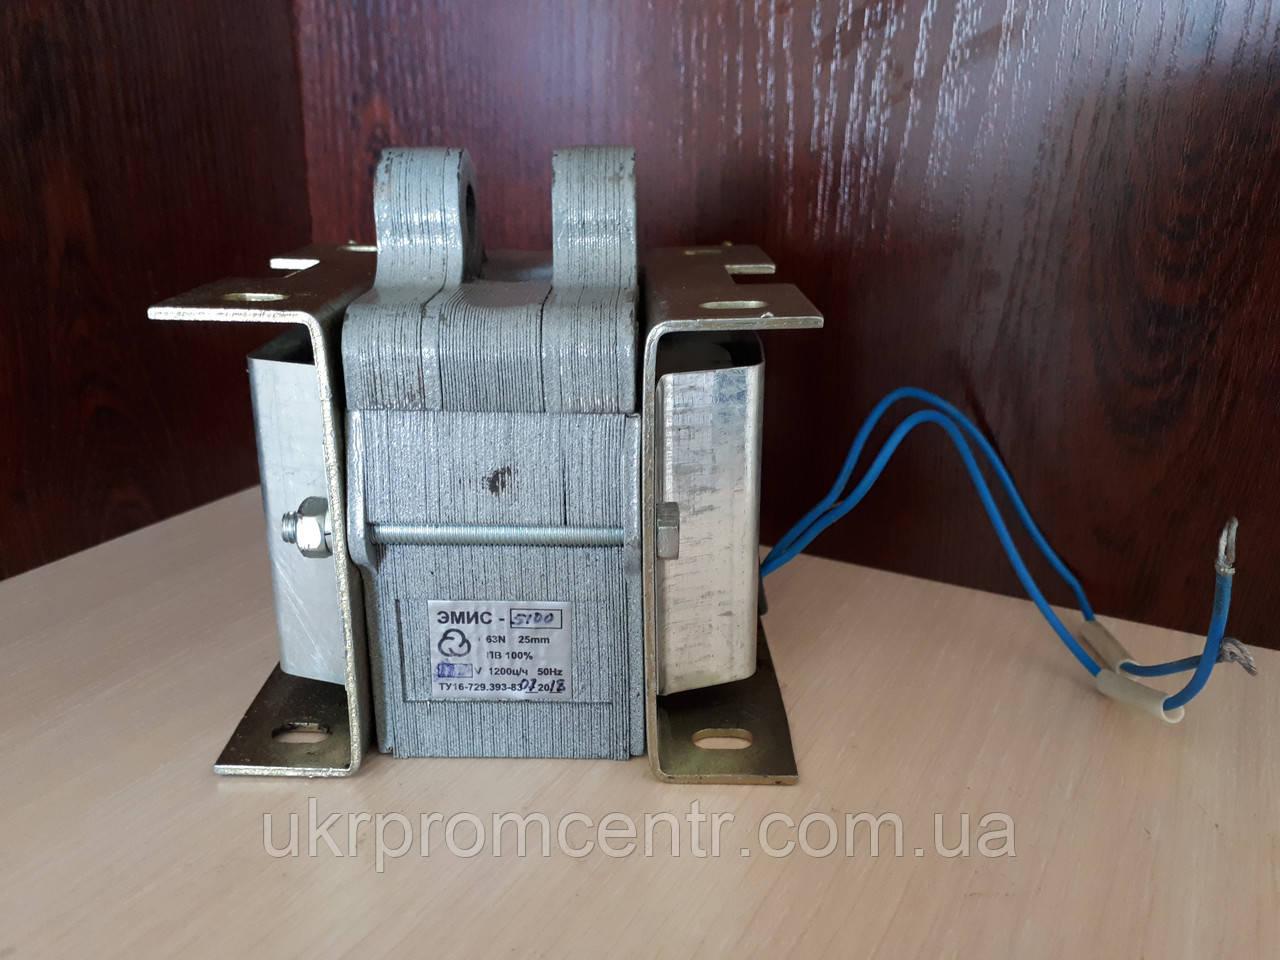 Электромагнит ЭМИС 5100, ЭМИС 5200